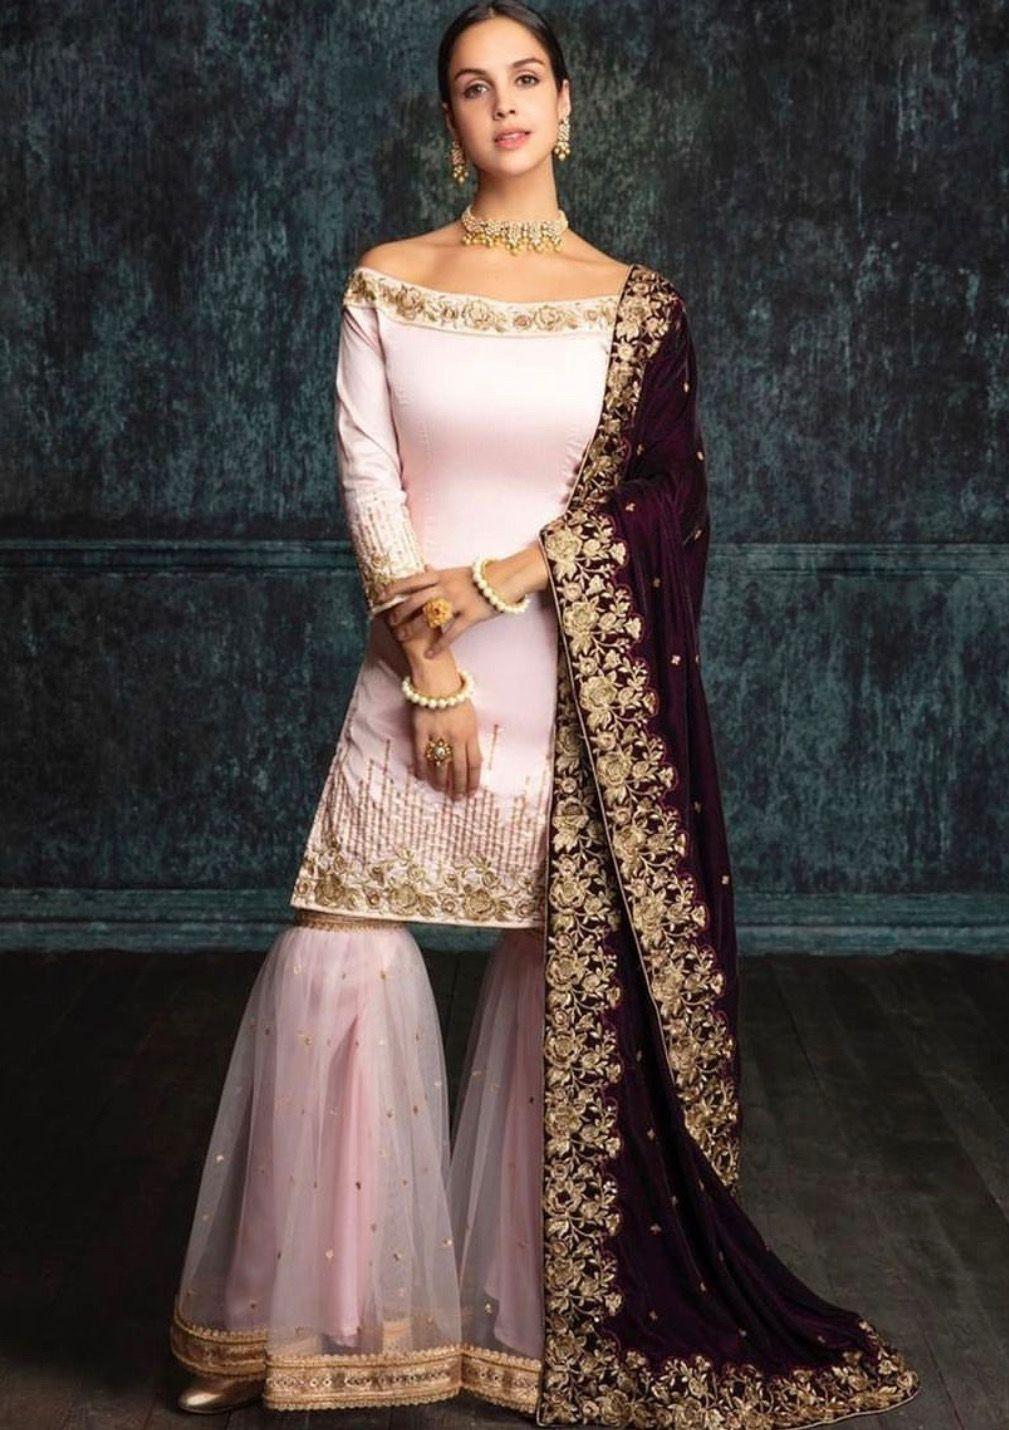 71373d6a4b Pinterest: @pawank90 | Sharara and Palazzo in 2019 | Fashion, Velvet ...